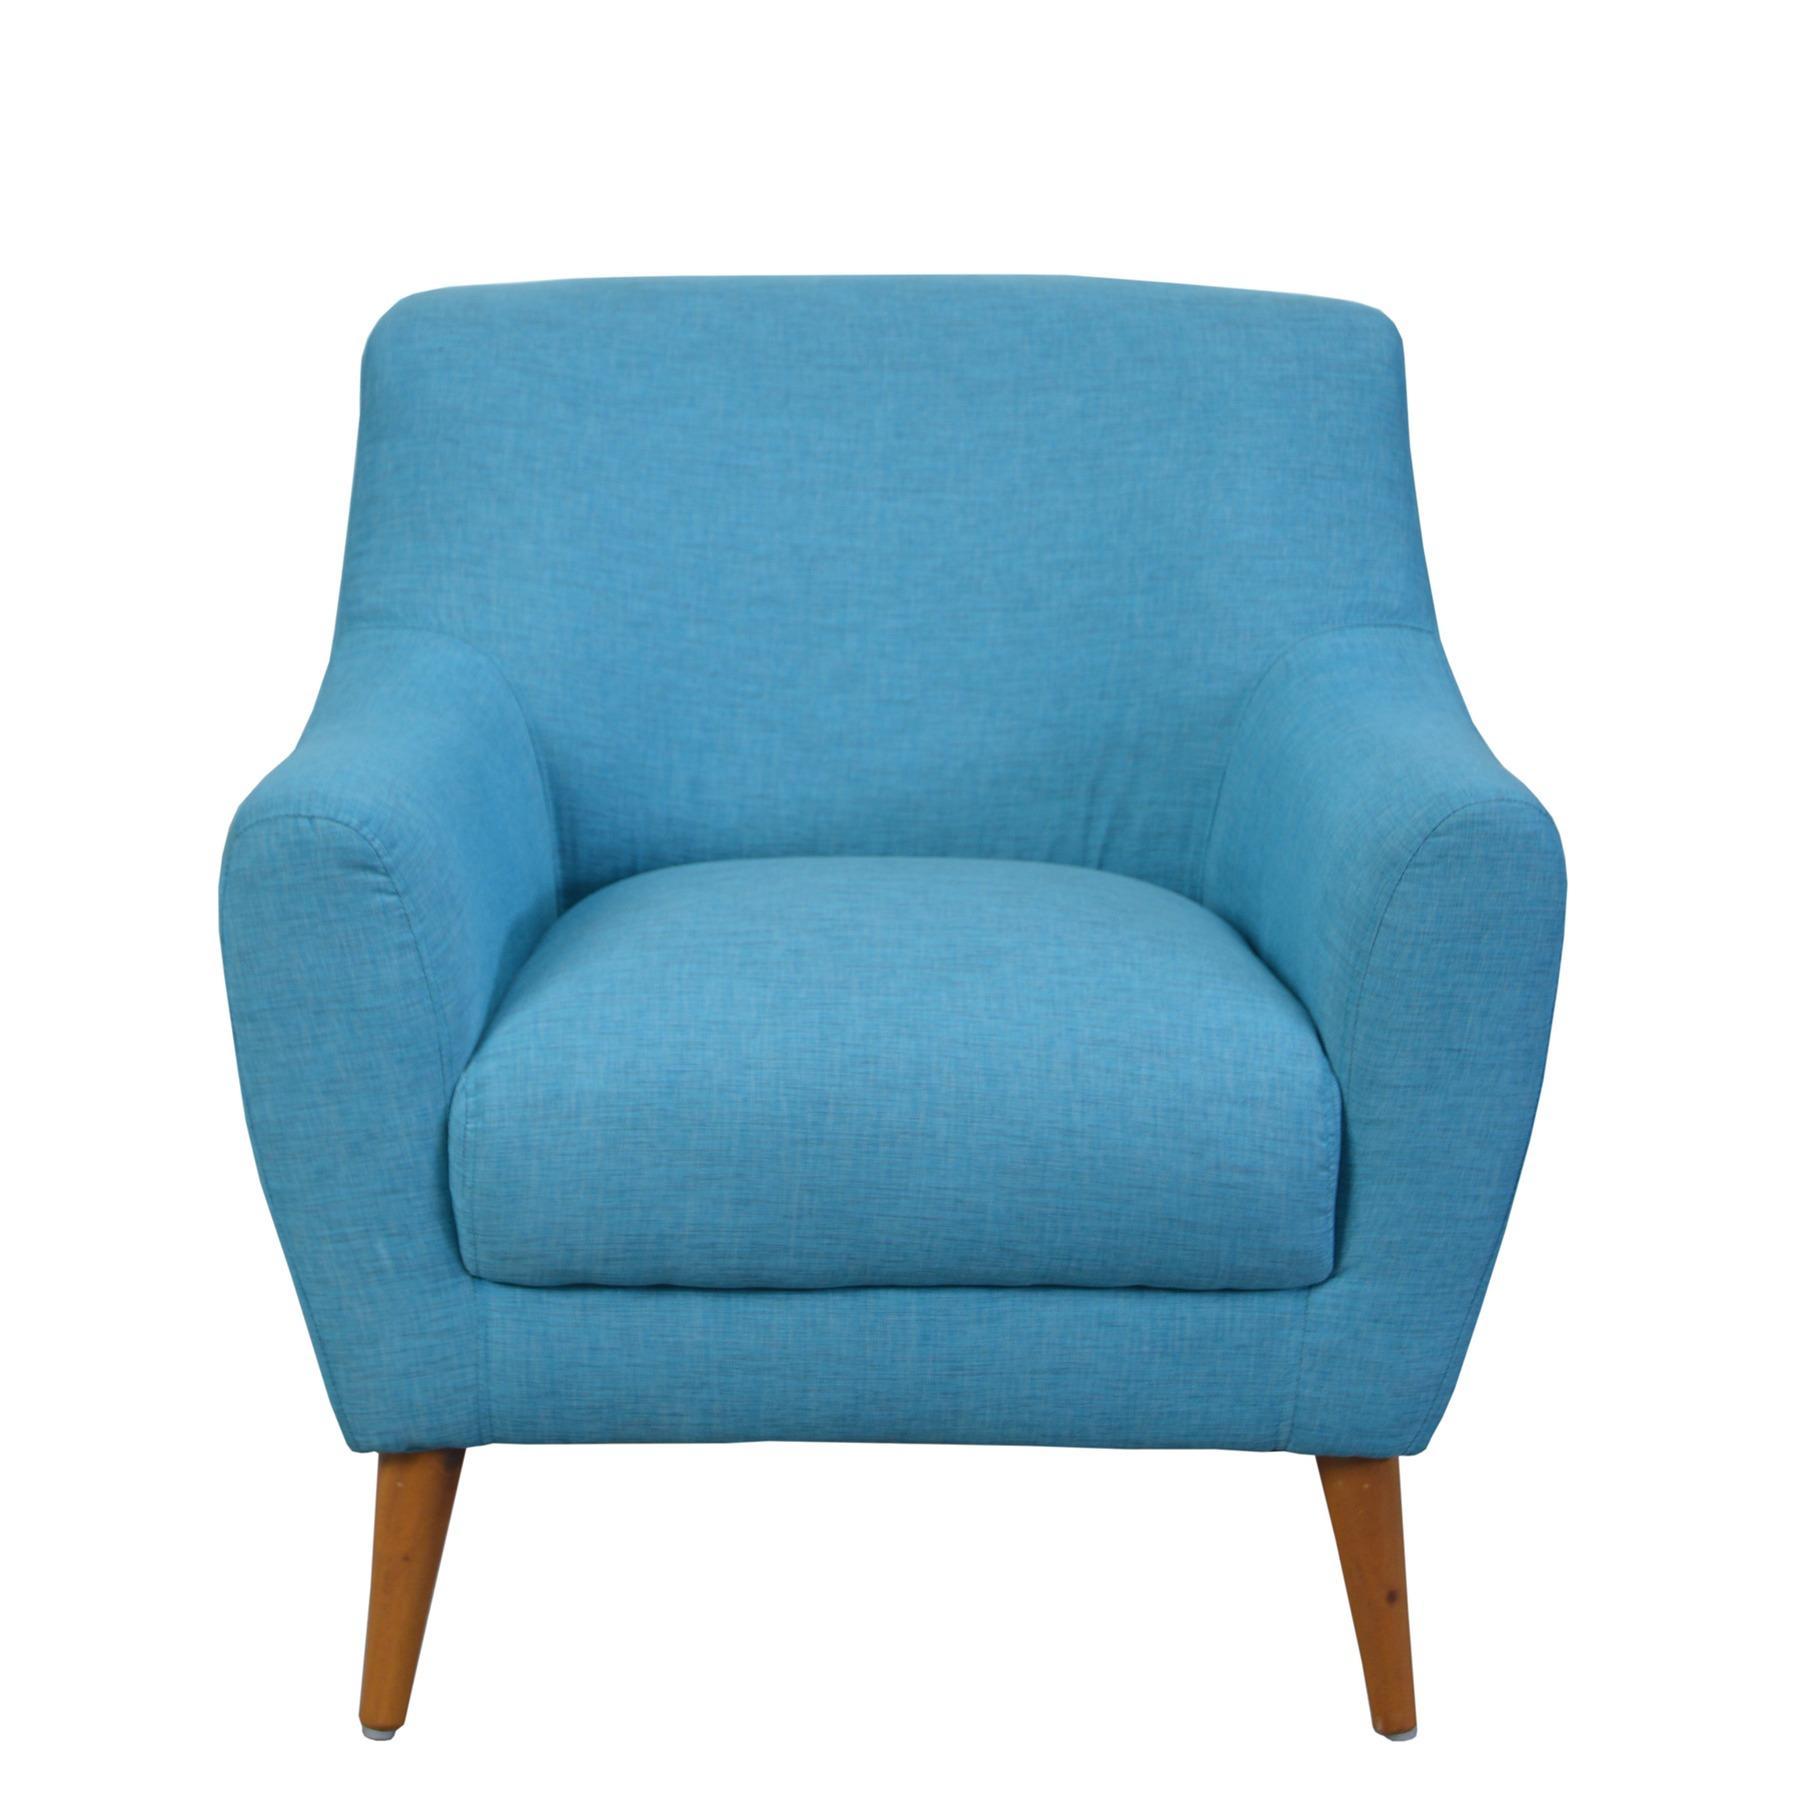 Sofa Isabel 1 Seater - Biru - Khusus Jabodetabek